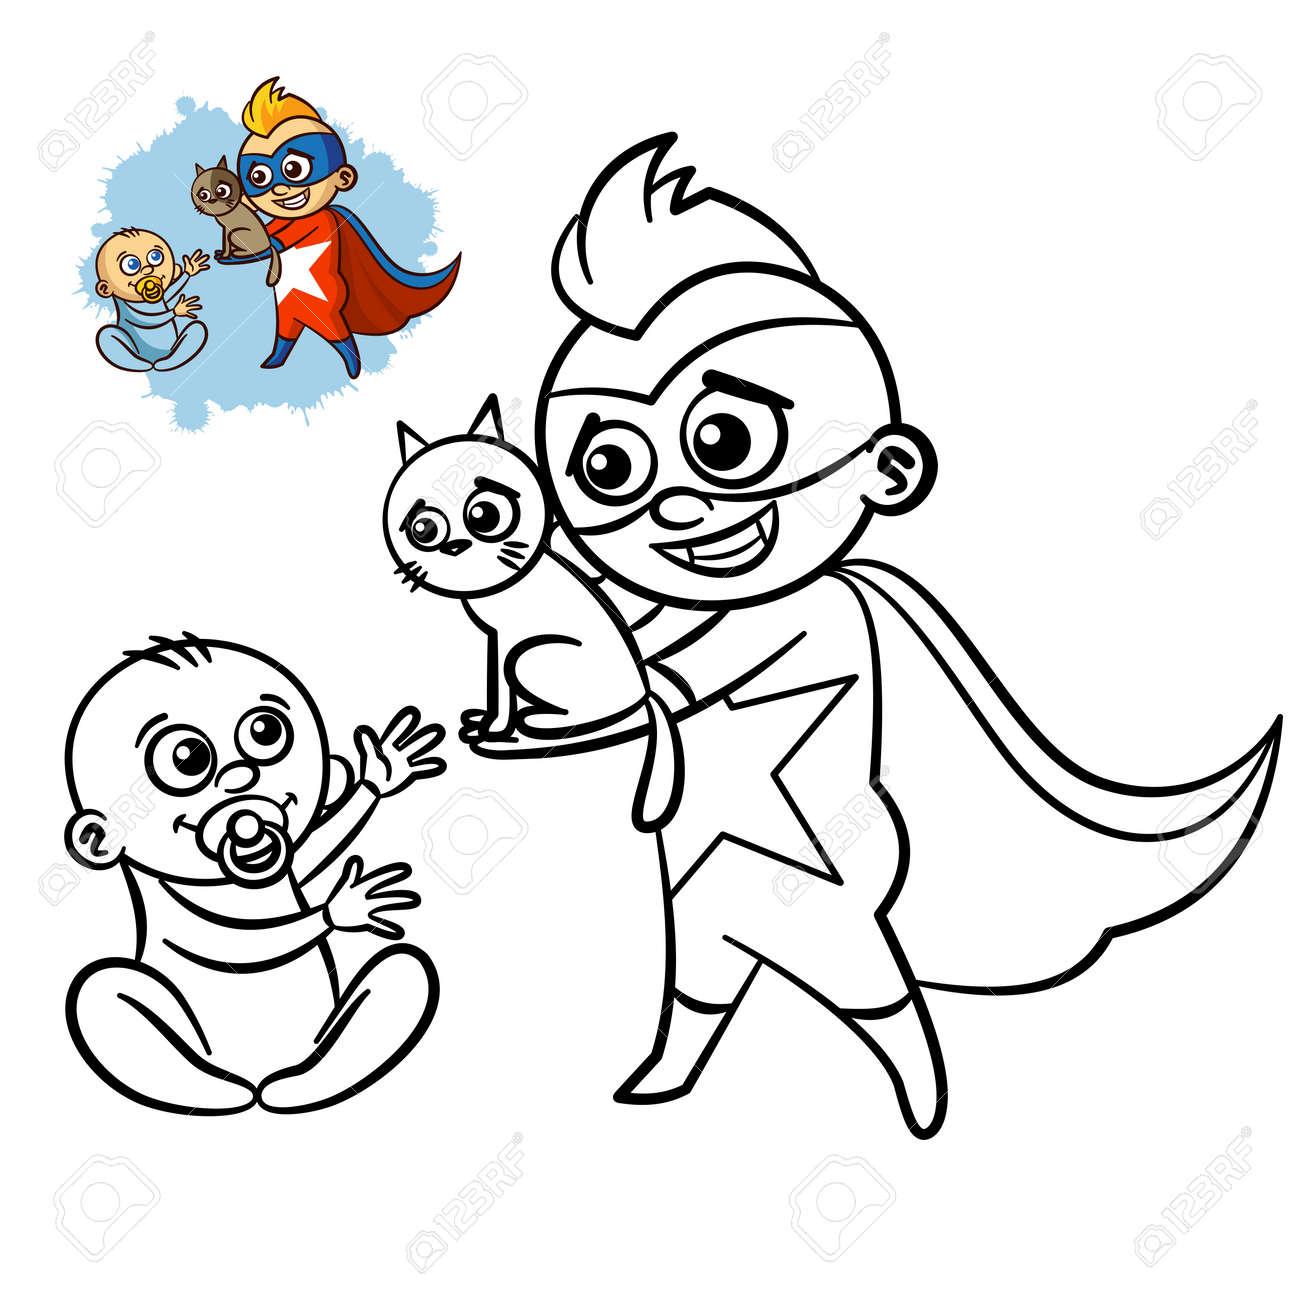 Vistoso Transformadores Animados Para Colorear Adorno - Enmarcado ...